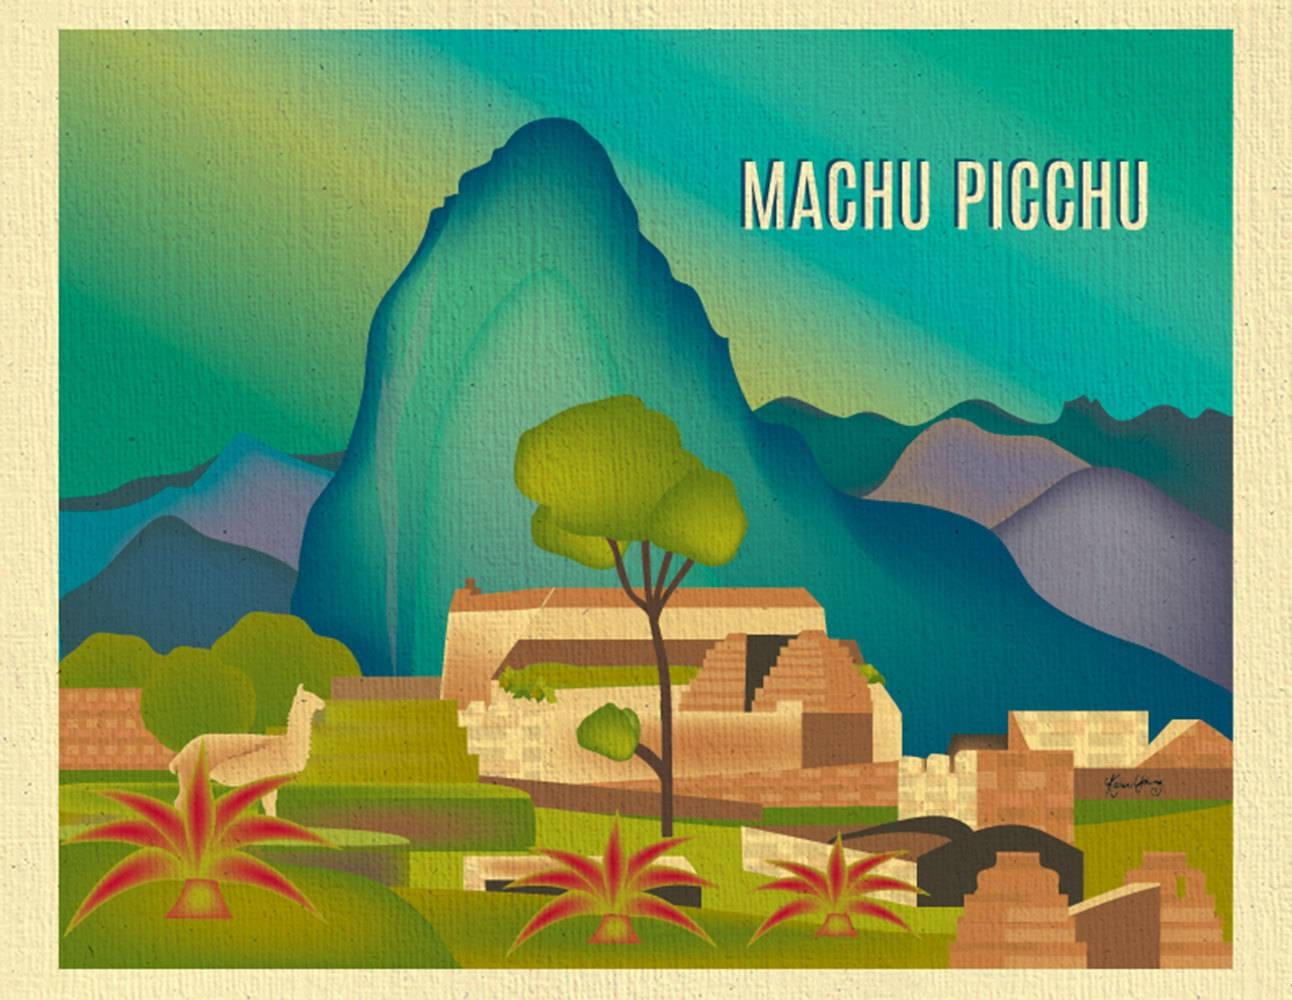 Machu Picchu Skyline Art Print Peru Artwork Loose Petals Within Most Popular Peruvian Wall Art (View 7 of 30)